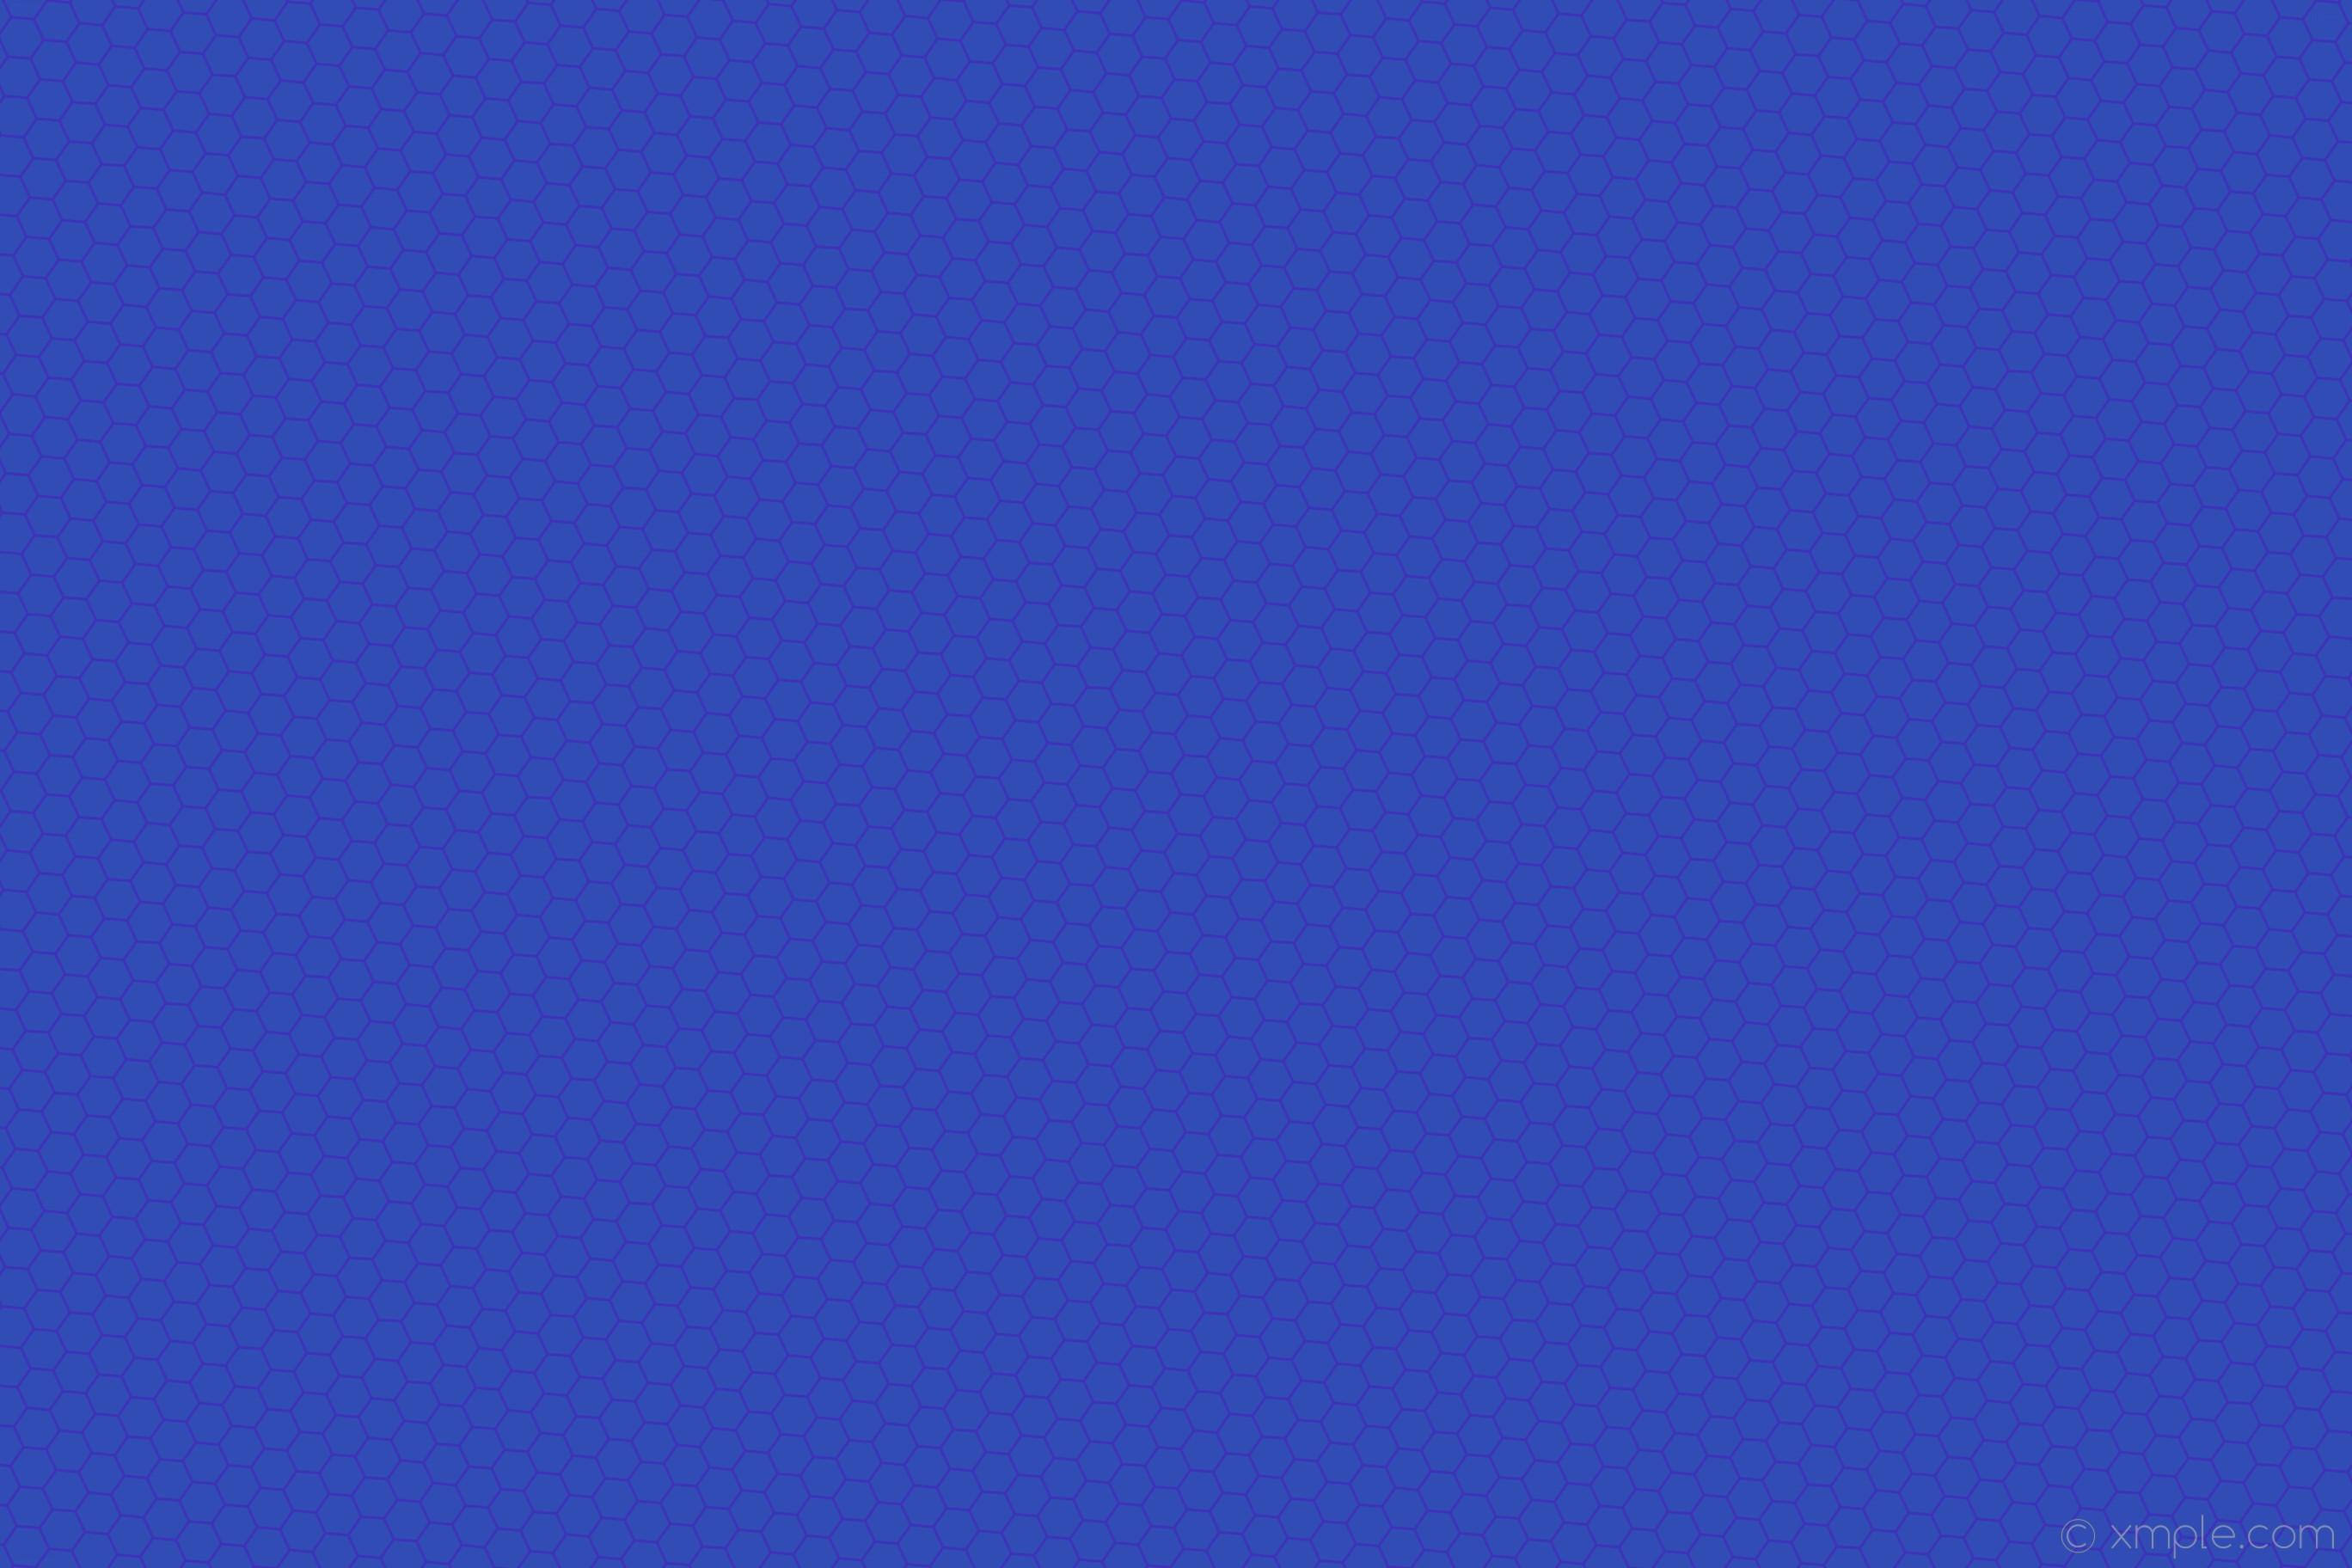 Res: 2736x1824, wallpaper beehive honeycomb blue hexagon #314db5 #3d31b5 diagonal 25° 3px  46px